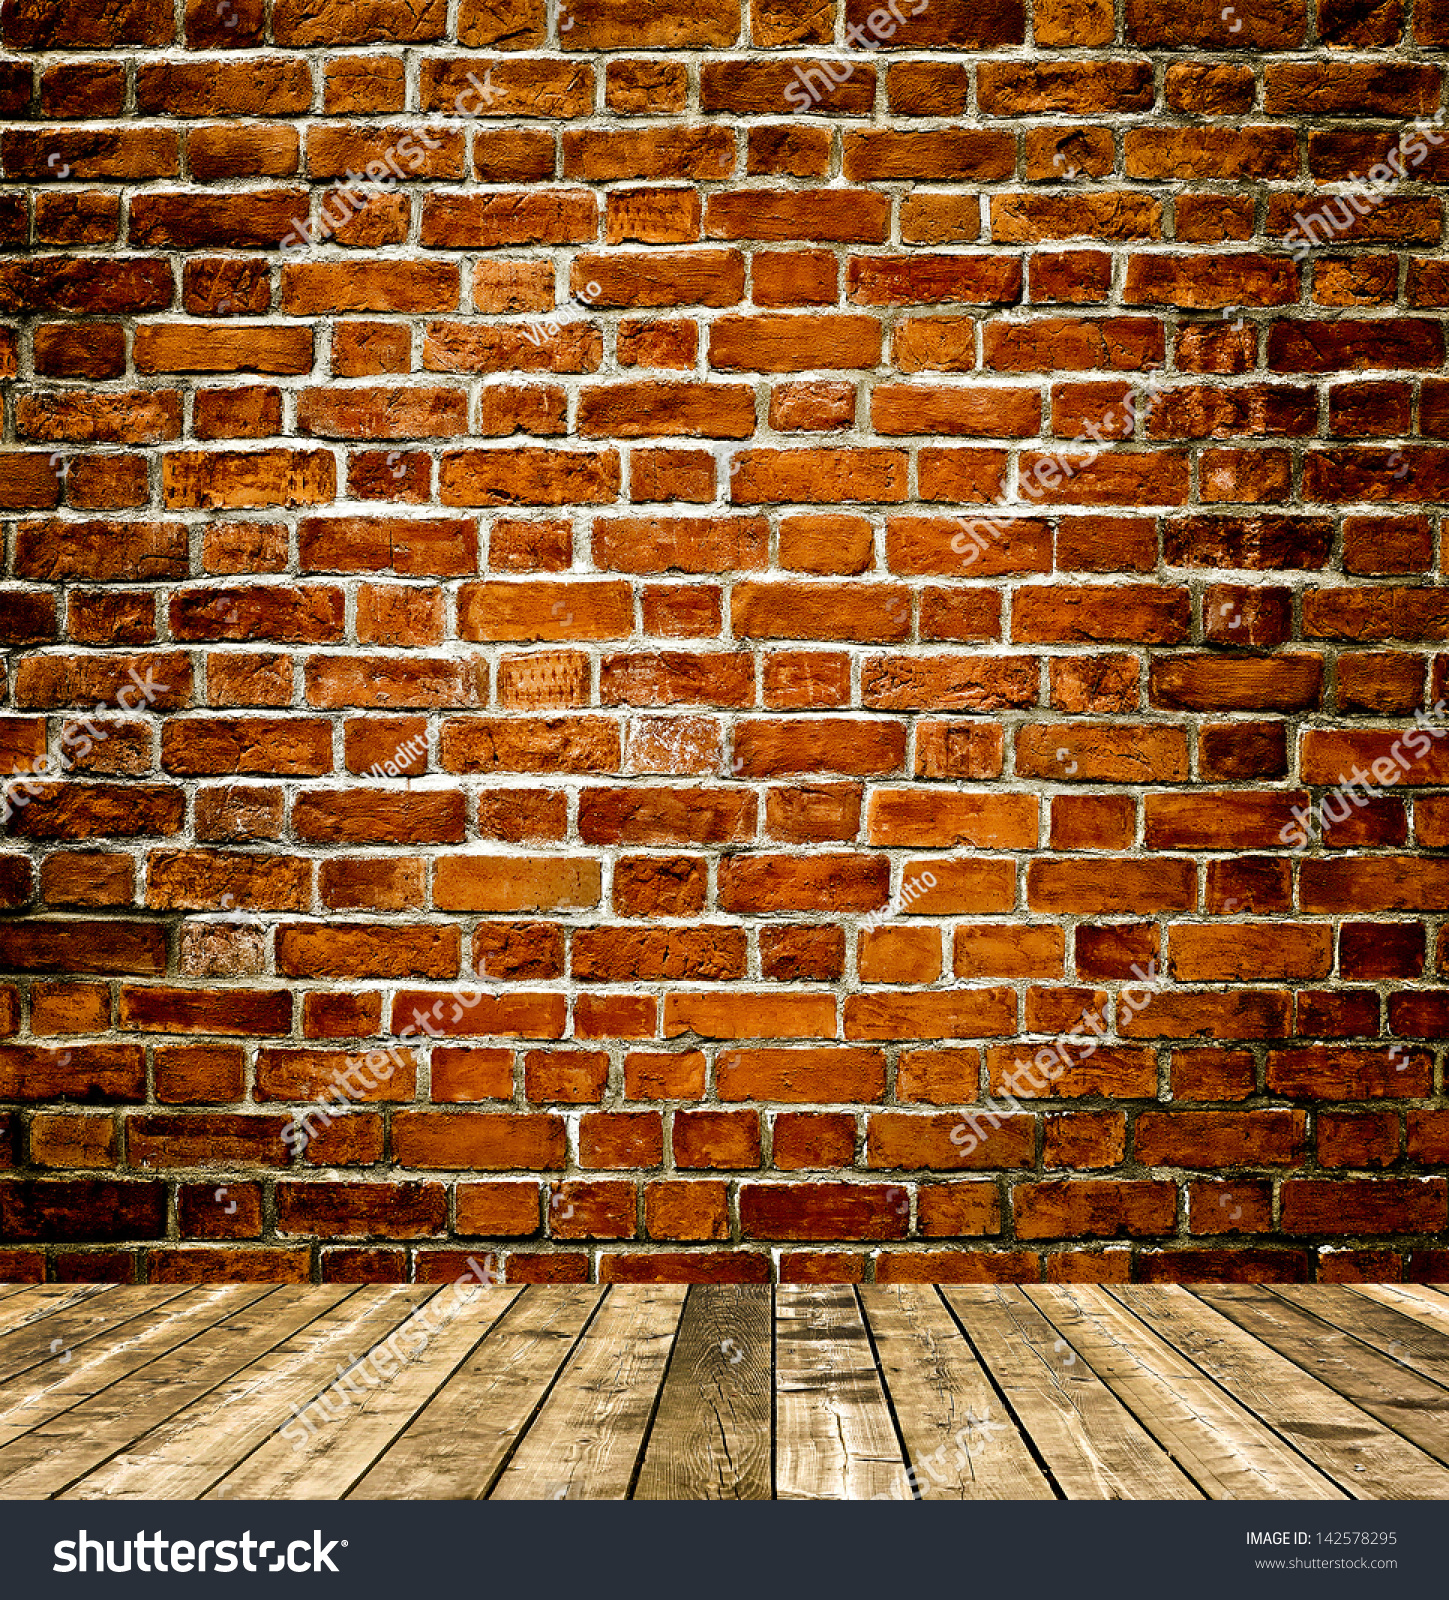 Red Brick Stone : Grungy textured red brick stone wall stock photo